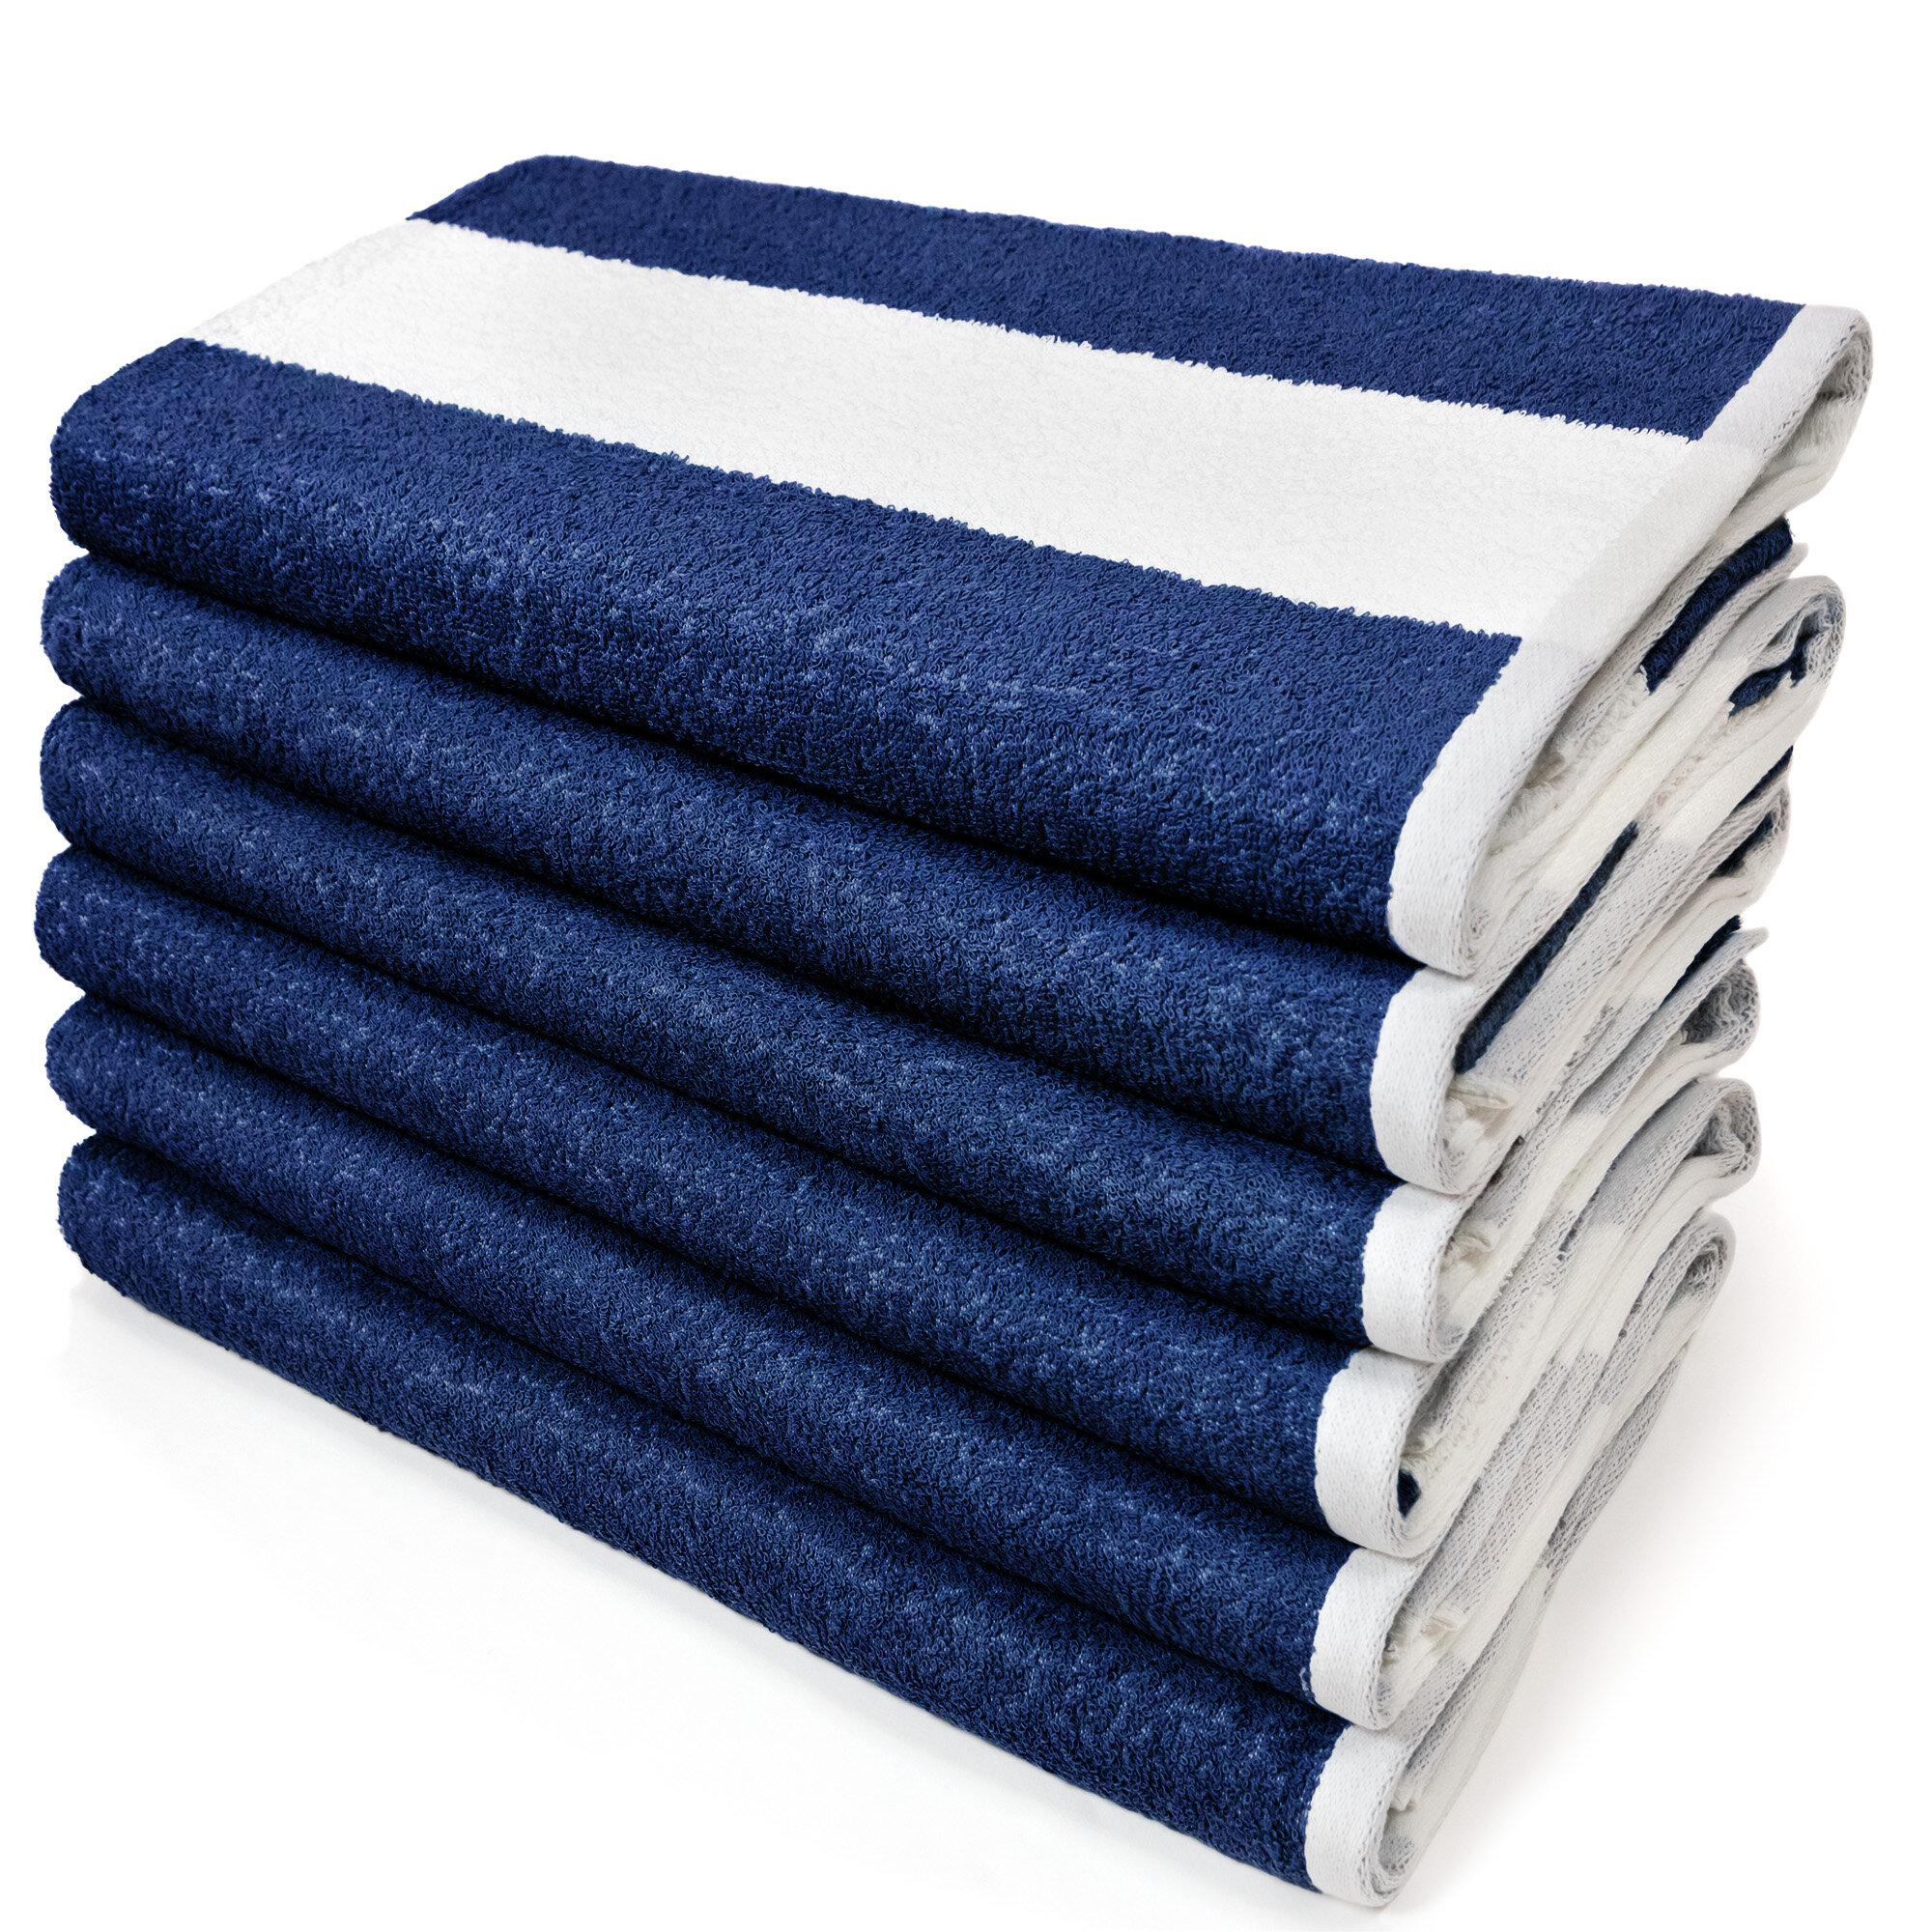 Kaufman Sales 6 Piece 100 Cotton Beach Towel Set Reviews Wayfair